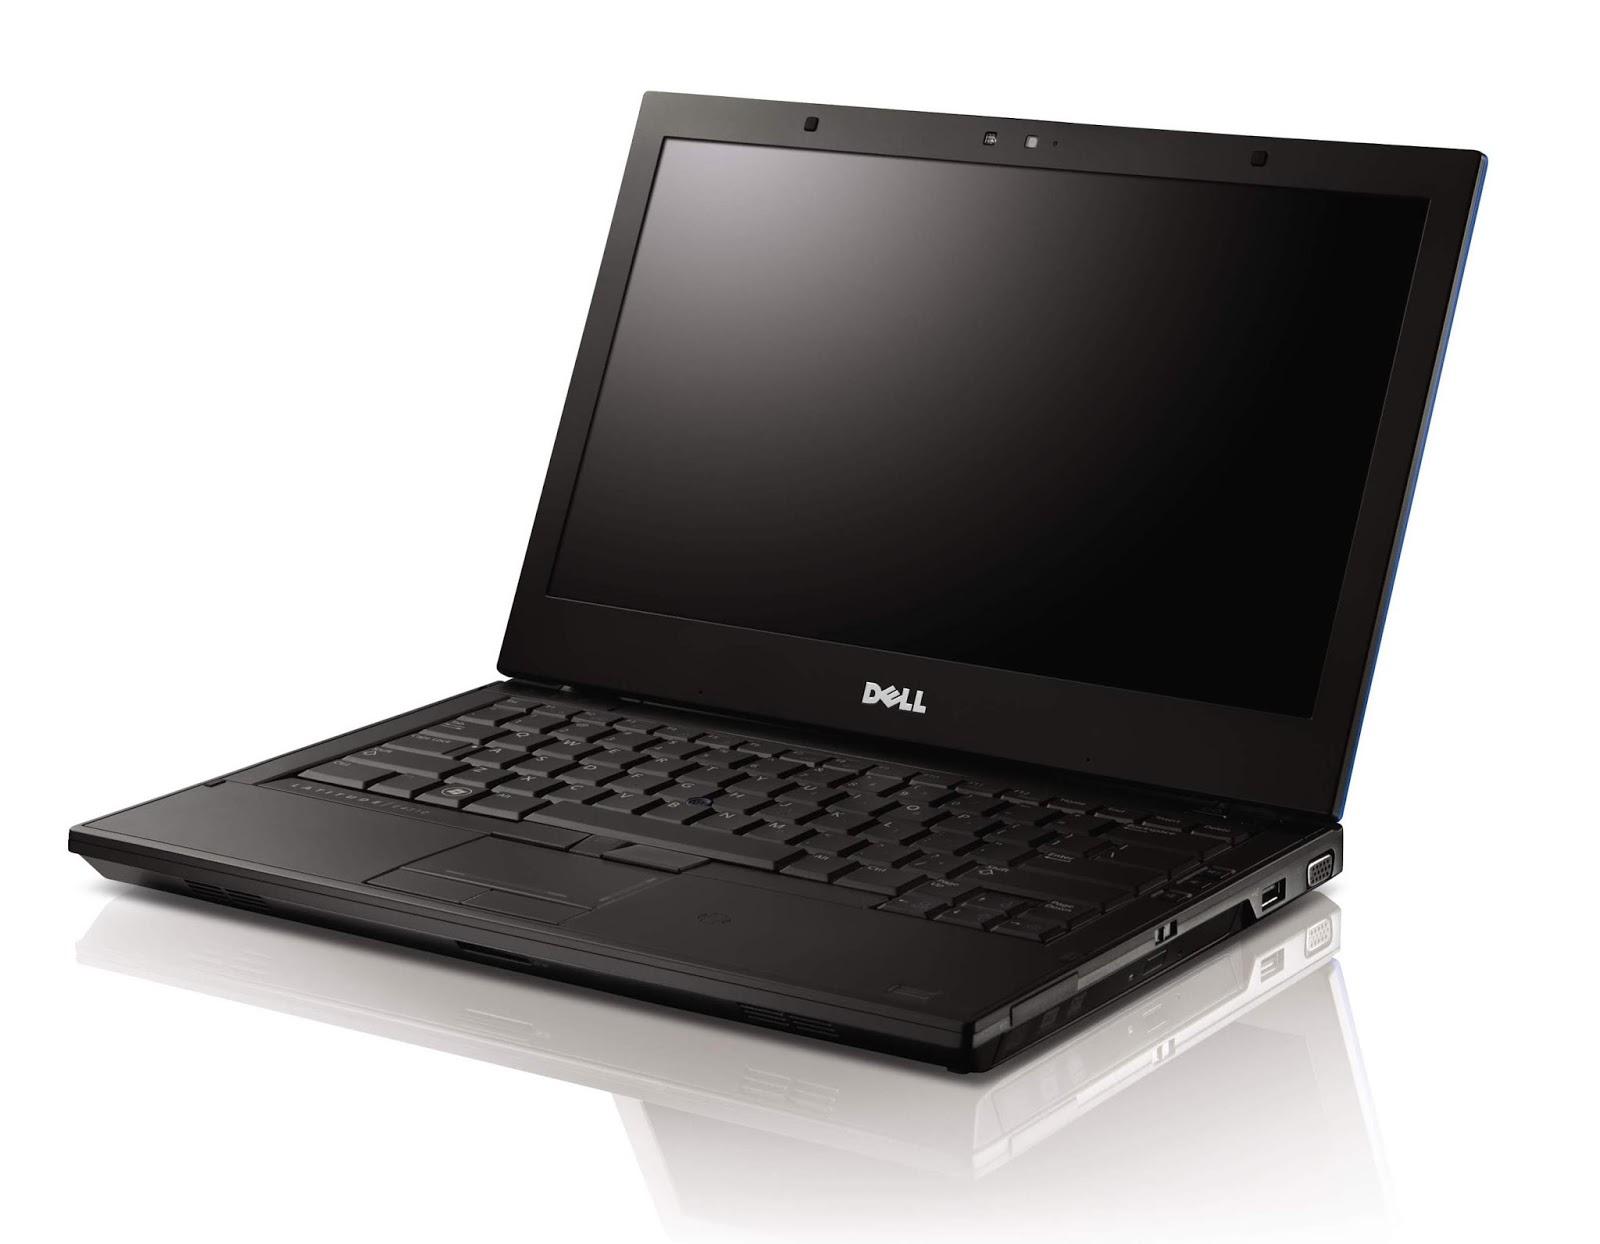 Laptop Second Berkah Cahaya Computer Asus Fe170cg Fonepad 7 8gb Hitam Dell E4310 Core I5 13 2525000